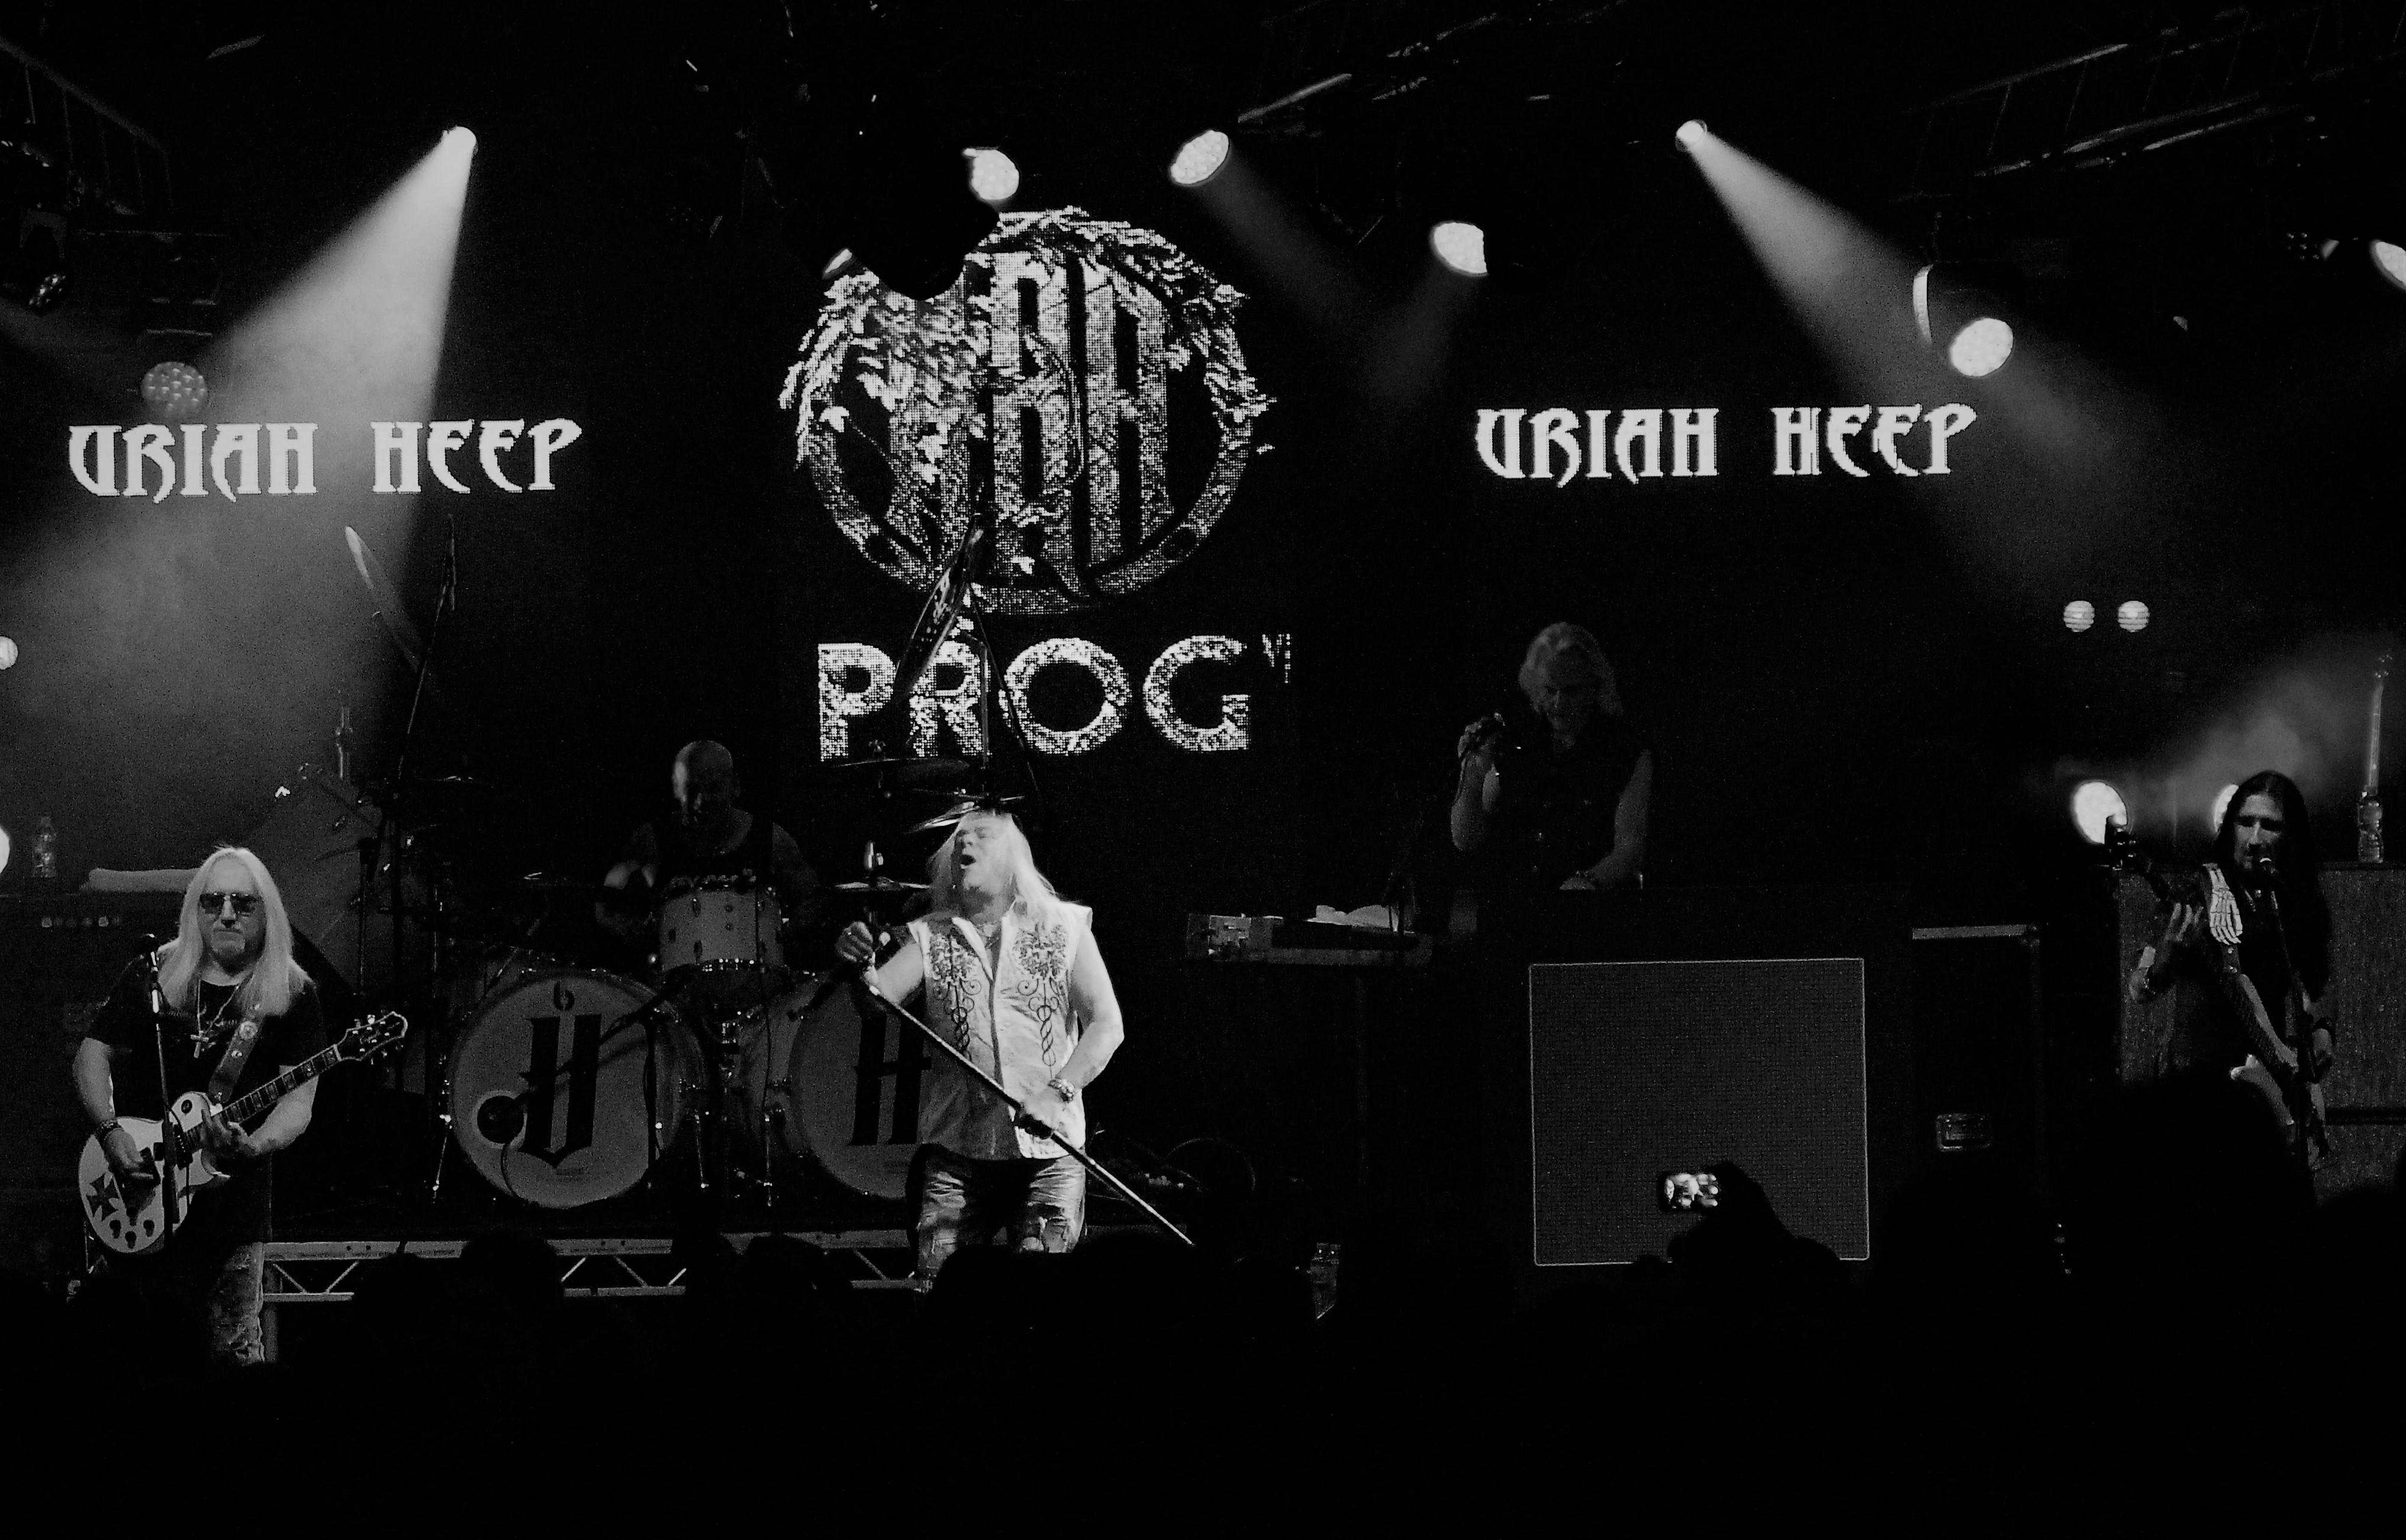 Day 2 - Main Stage_6 - Uriah Heep (1)